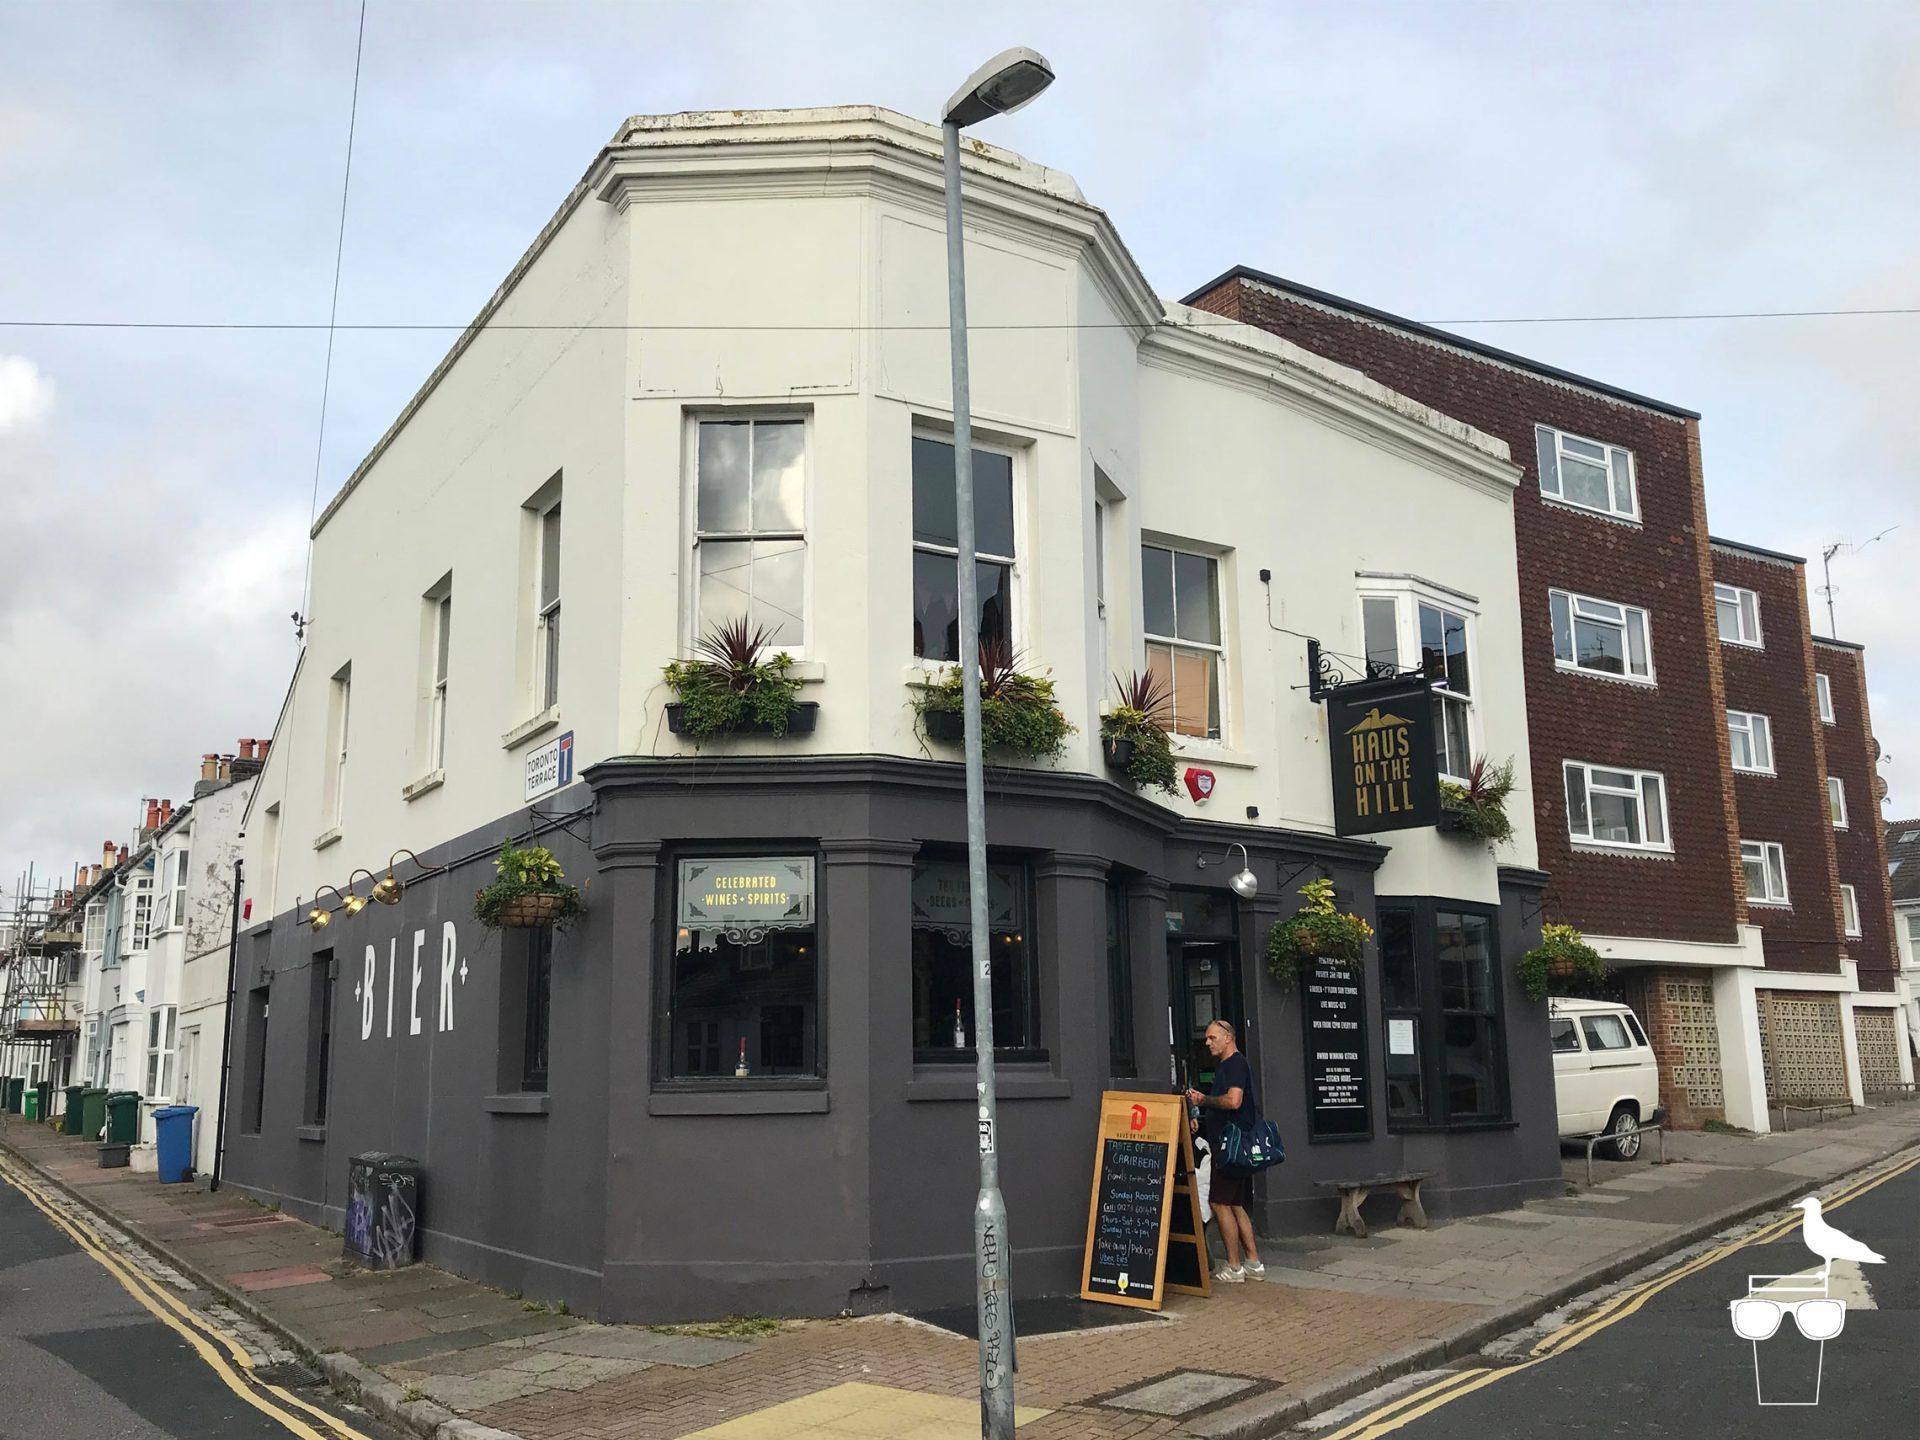 haus on the hill brighton pub hanover outside corner view